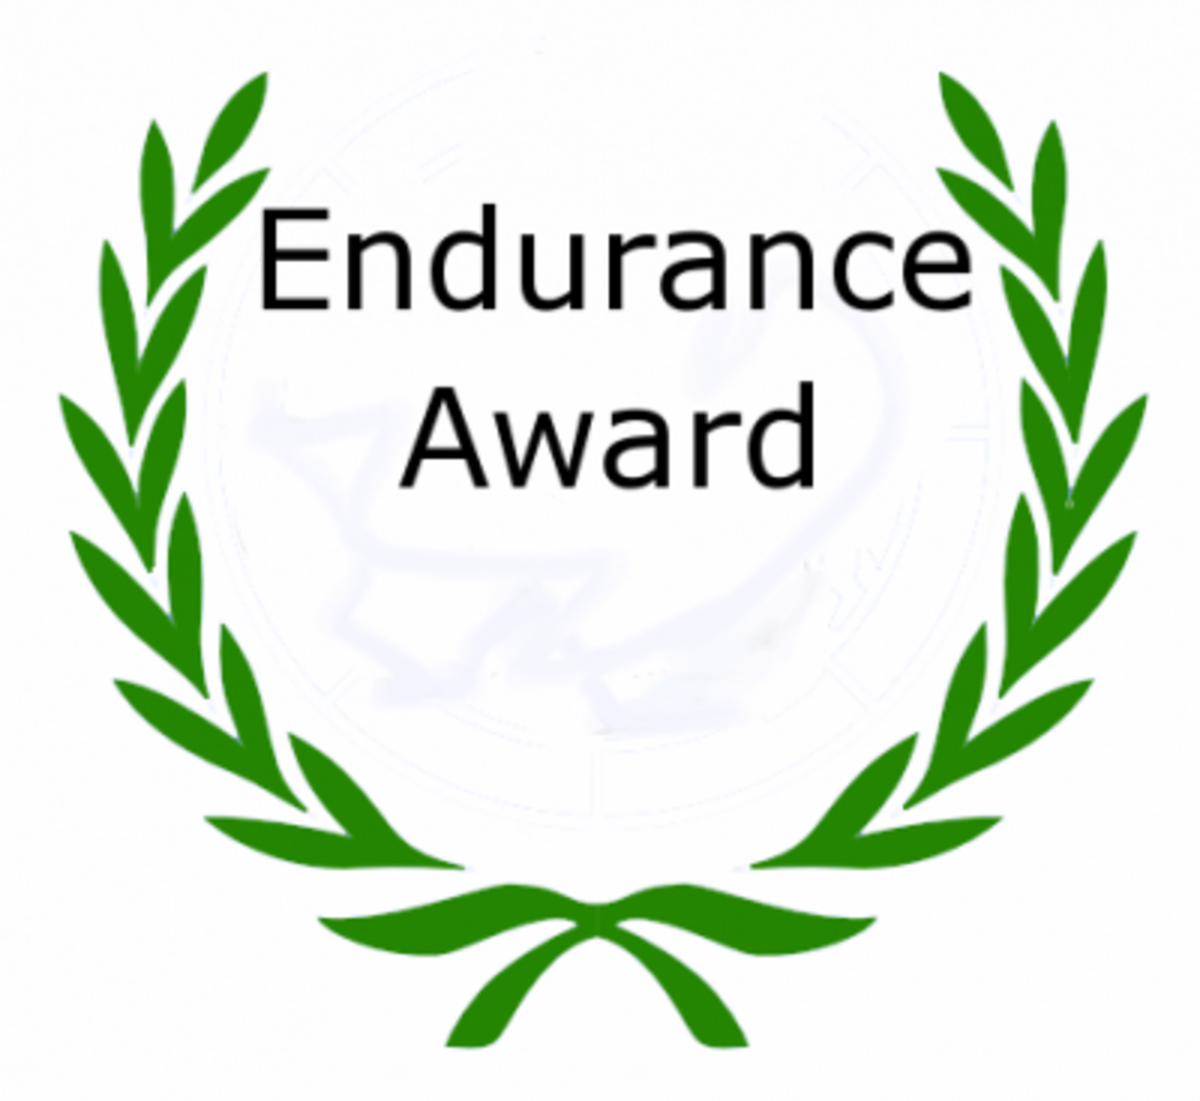 Endurance Award -- Essential Life Skills